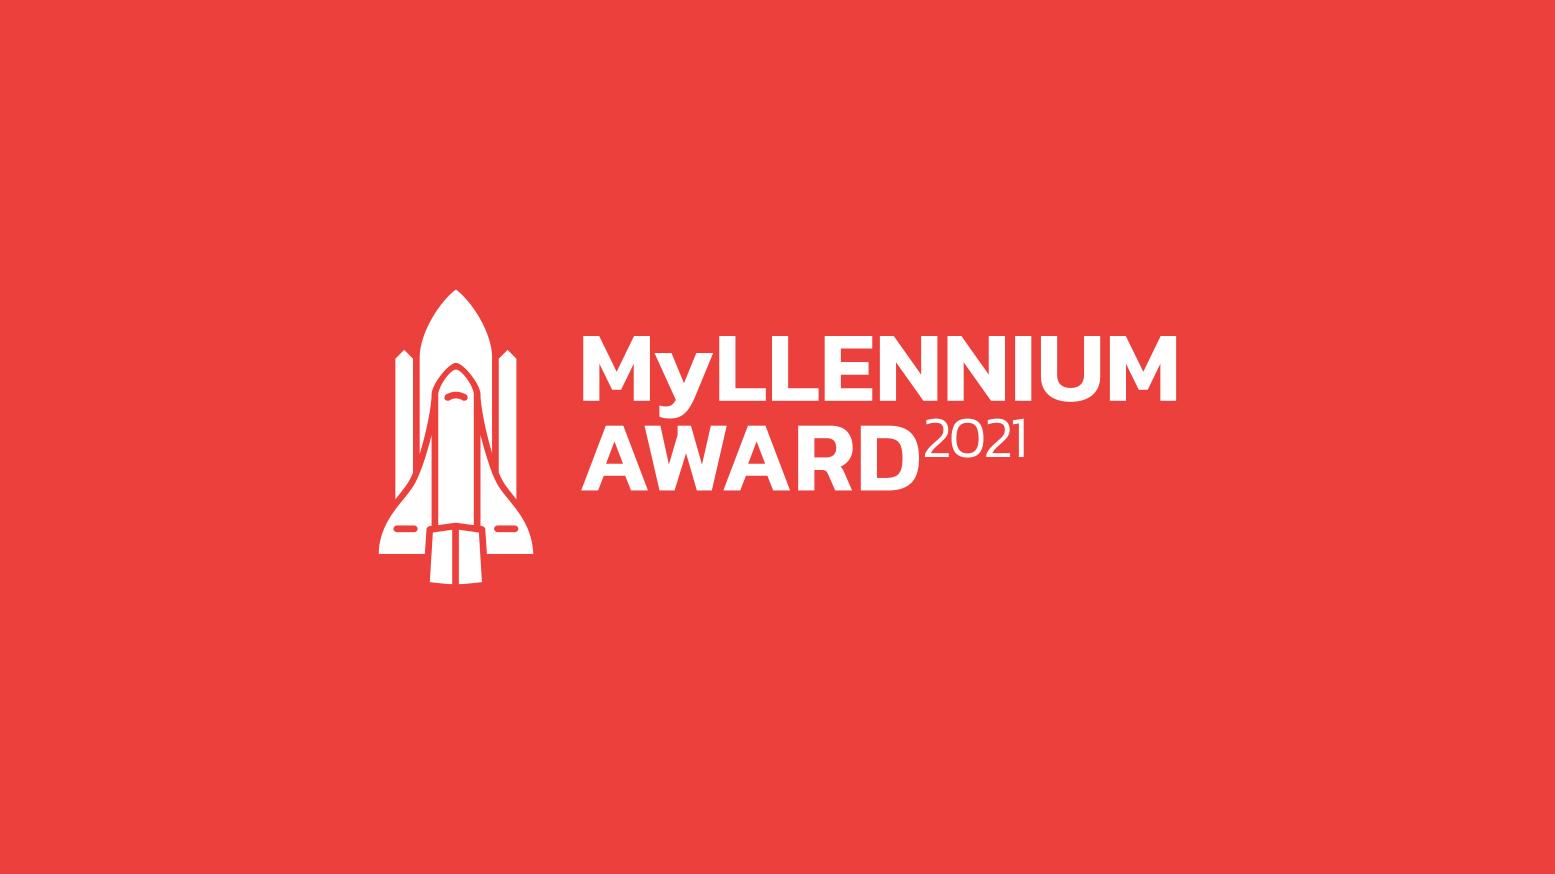 Gruppo Barletta - Myllennium Award